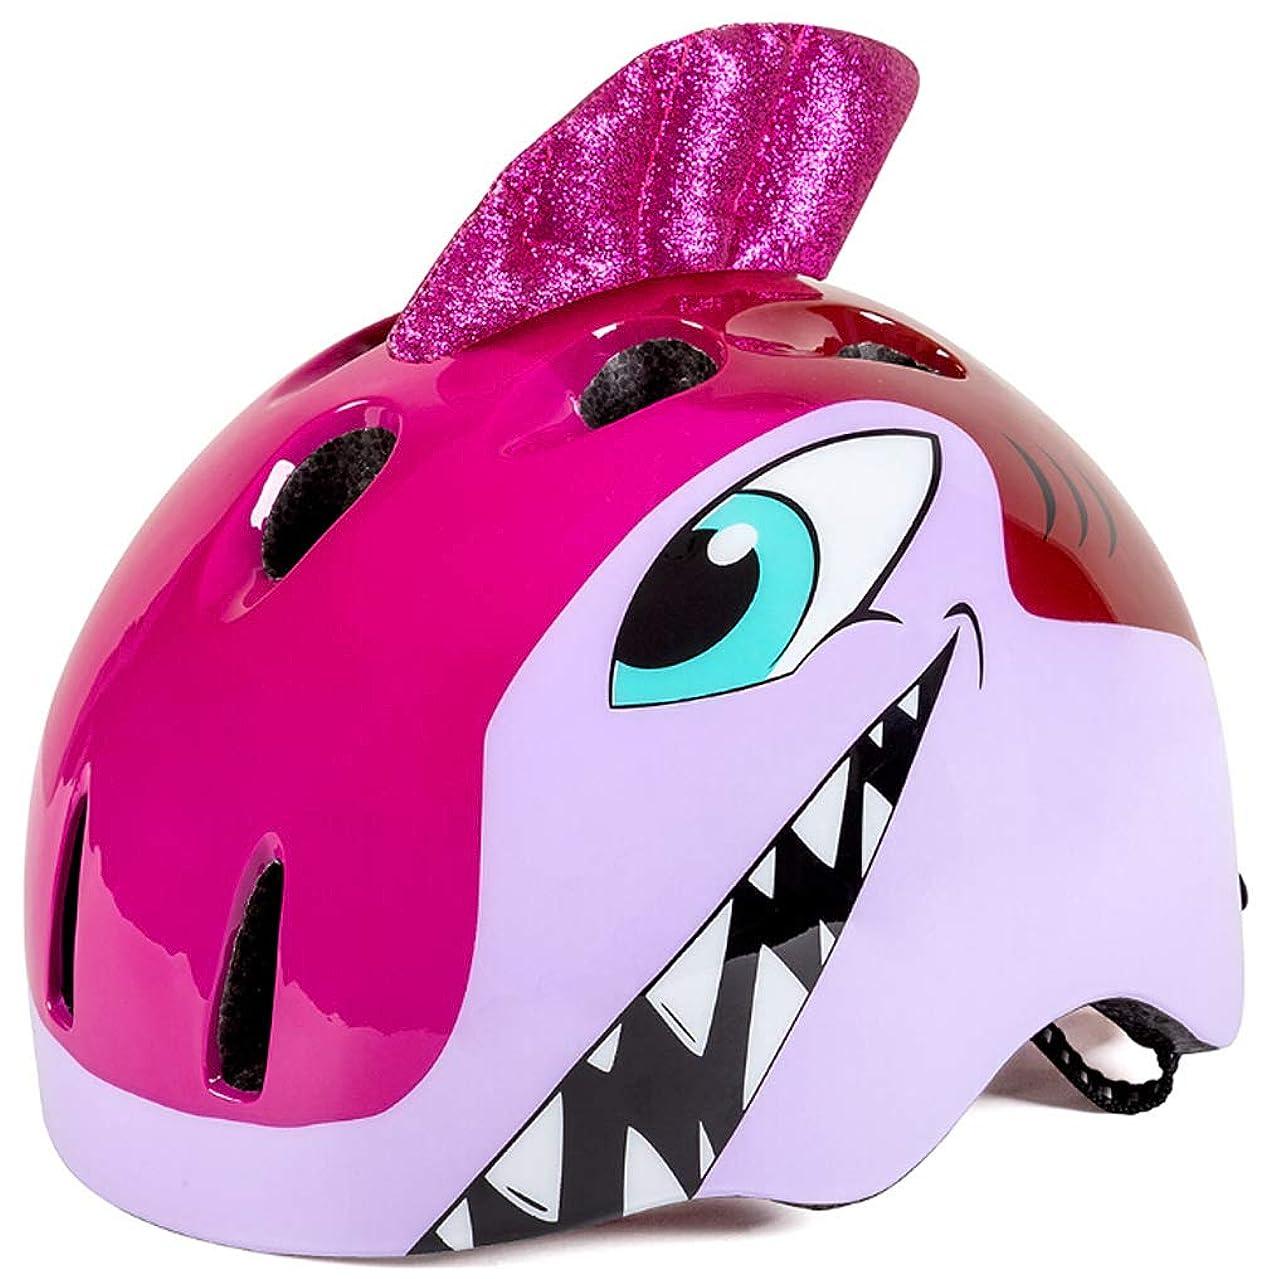 Pretty.auto Kids Helmet Shark Toddler Multi Sports Adjustable Helmet 3D Cartoon Animal Kids Bike Helmets for Girls&Boys